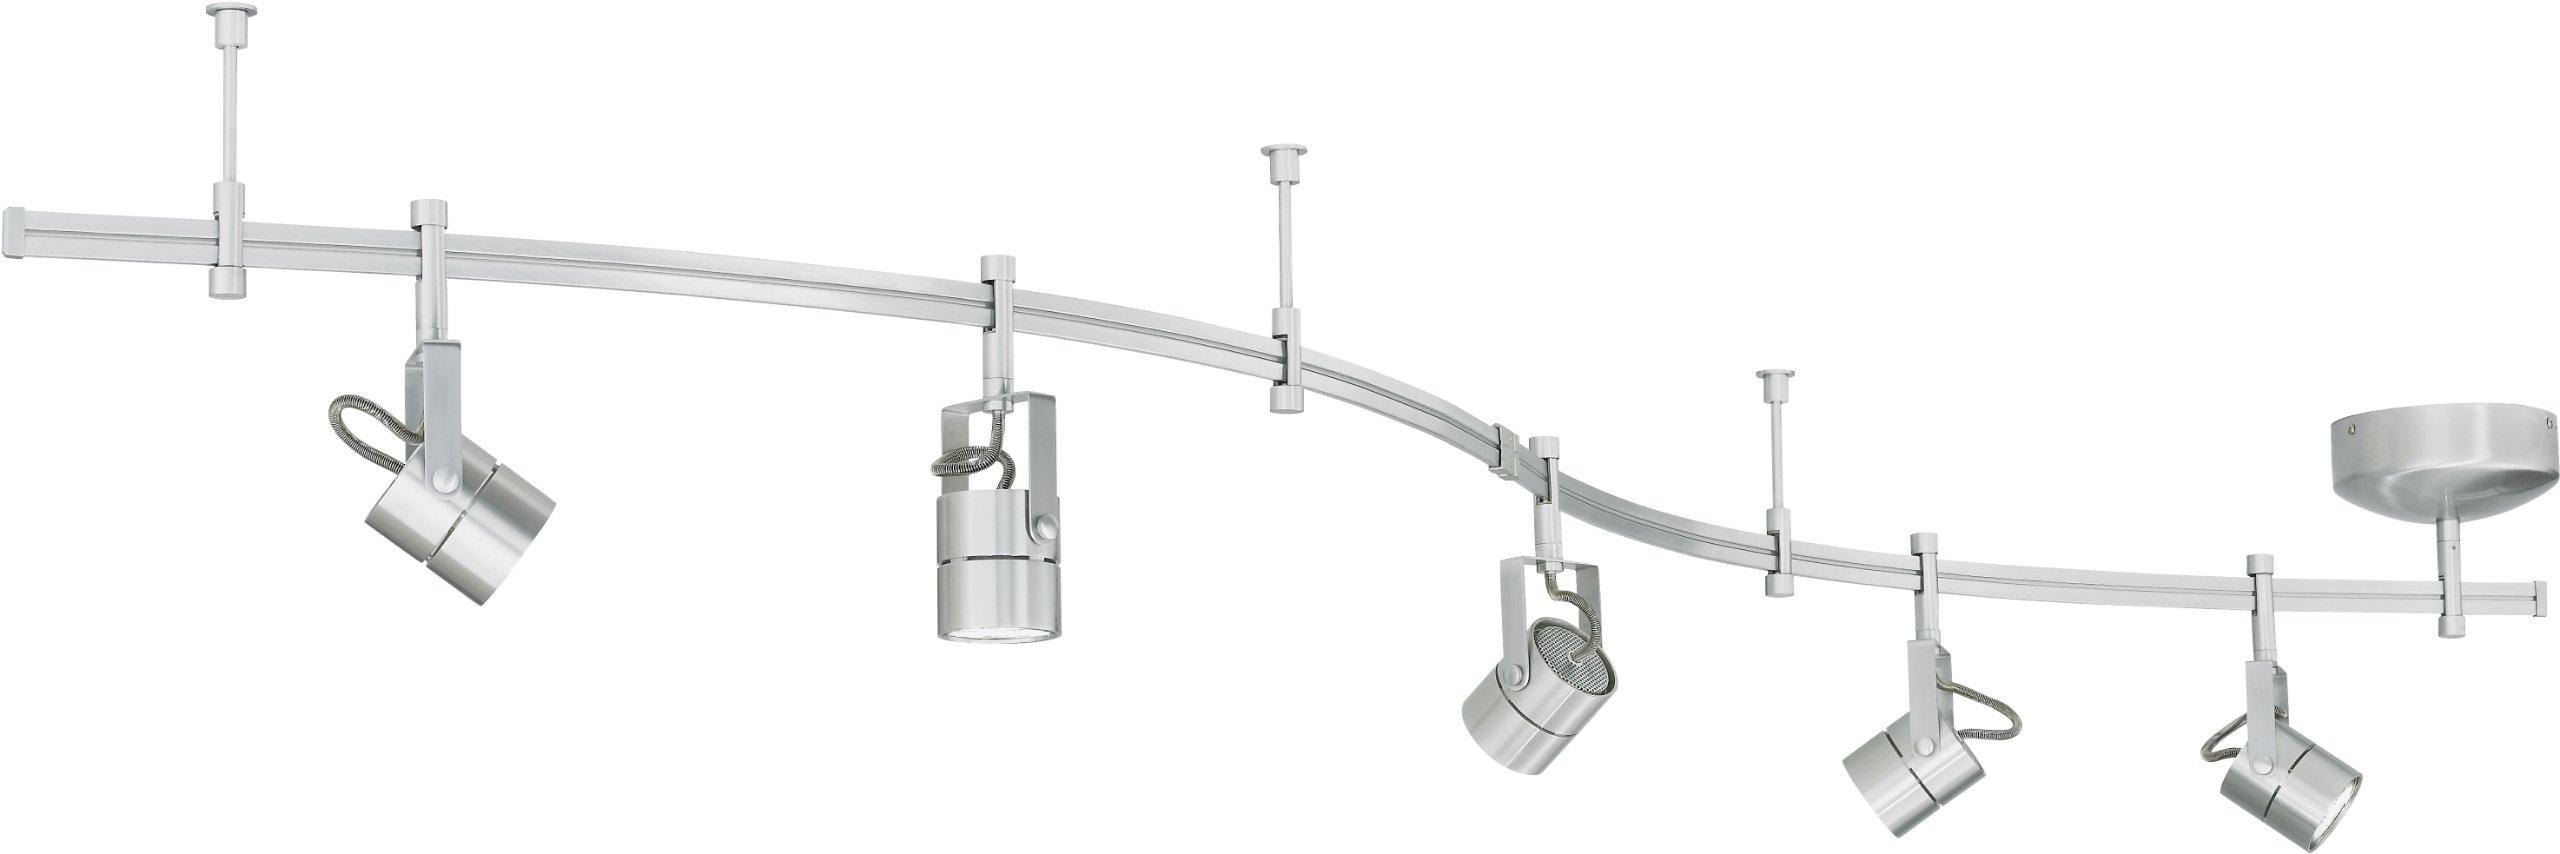 Tech Lighting 800RAL5FCN Focus Track Lighting Kits, 100 watt Flexible Track Light System, 8.5'' x 8.5'' x 8.5'', Matte Nickel